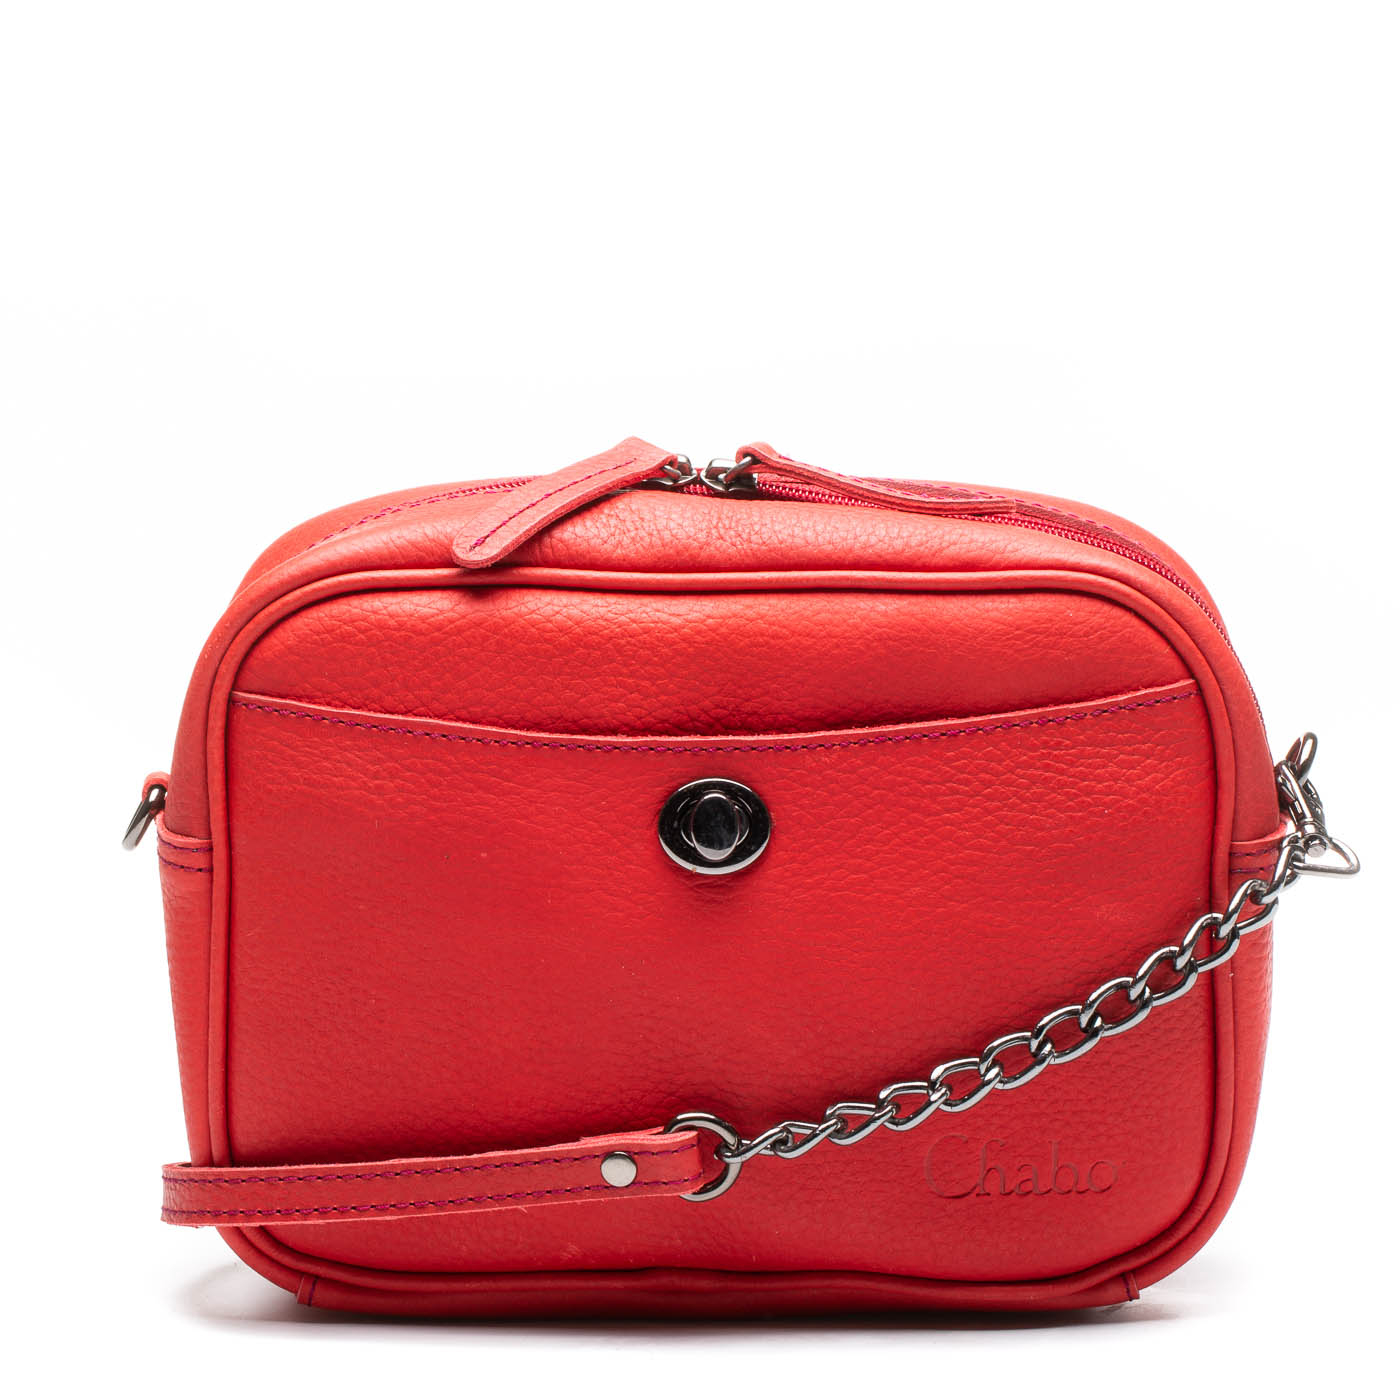 Chabo Bags Coco sac besace 8719274533573